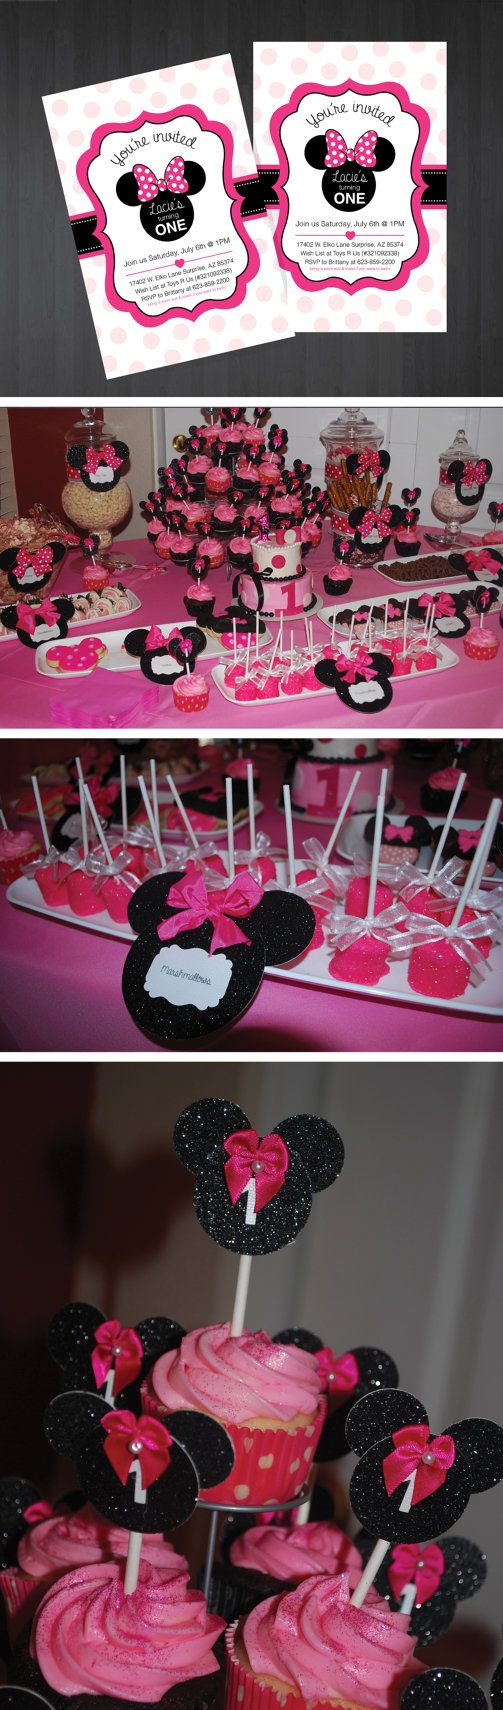 Custom Minnie Mouse Invitations $8  for 10 invitations